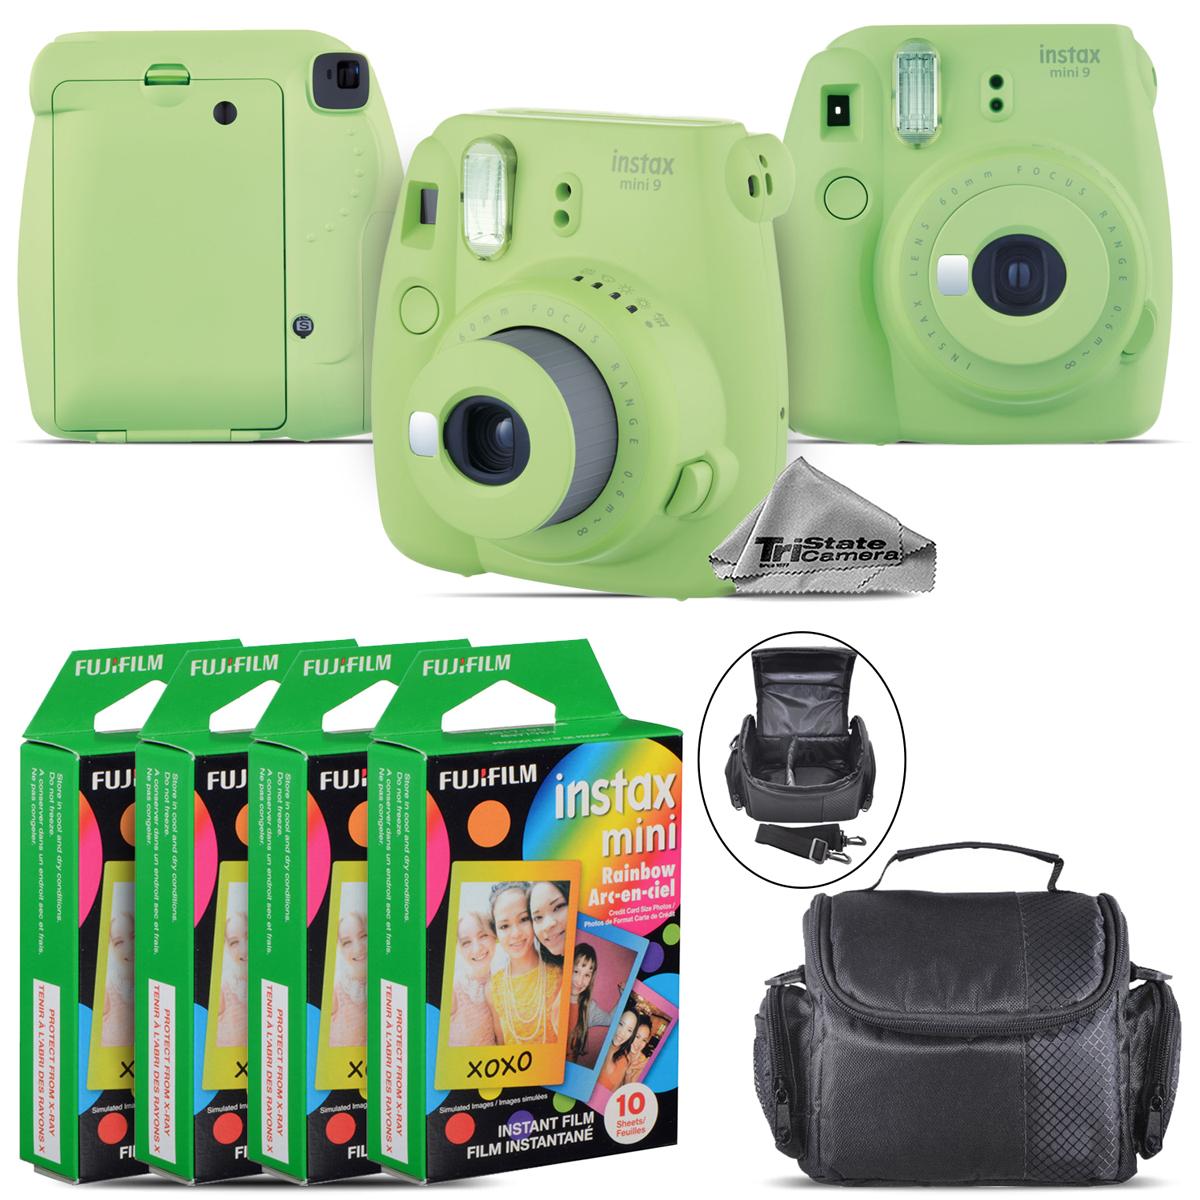 FujiFilm instax mini 9 Film Camera (Lime Green) + Large Case 40 Films Kit by Tri State Camera